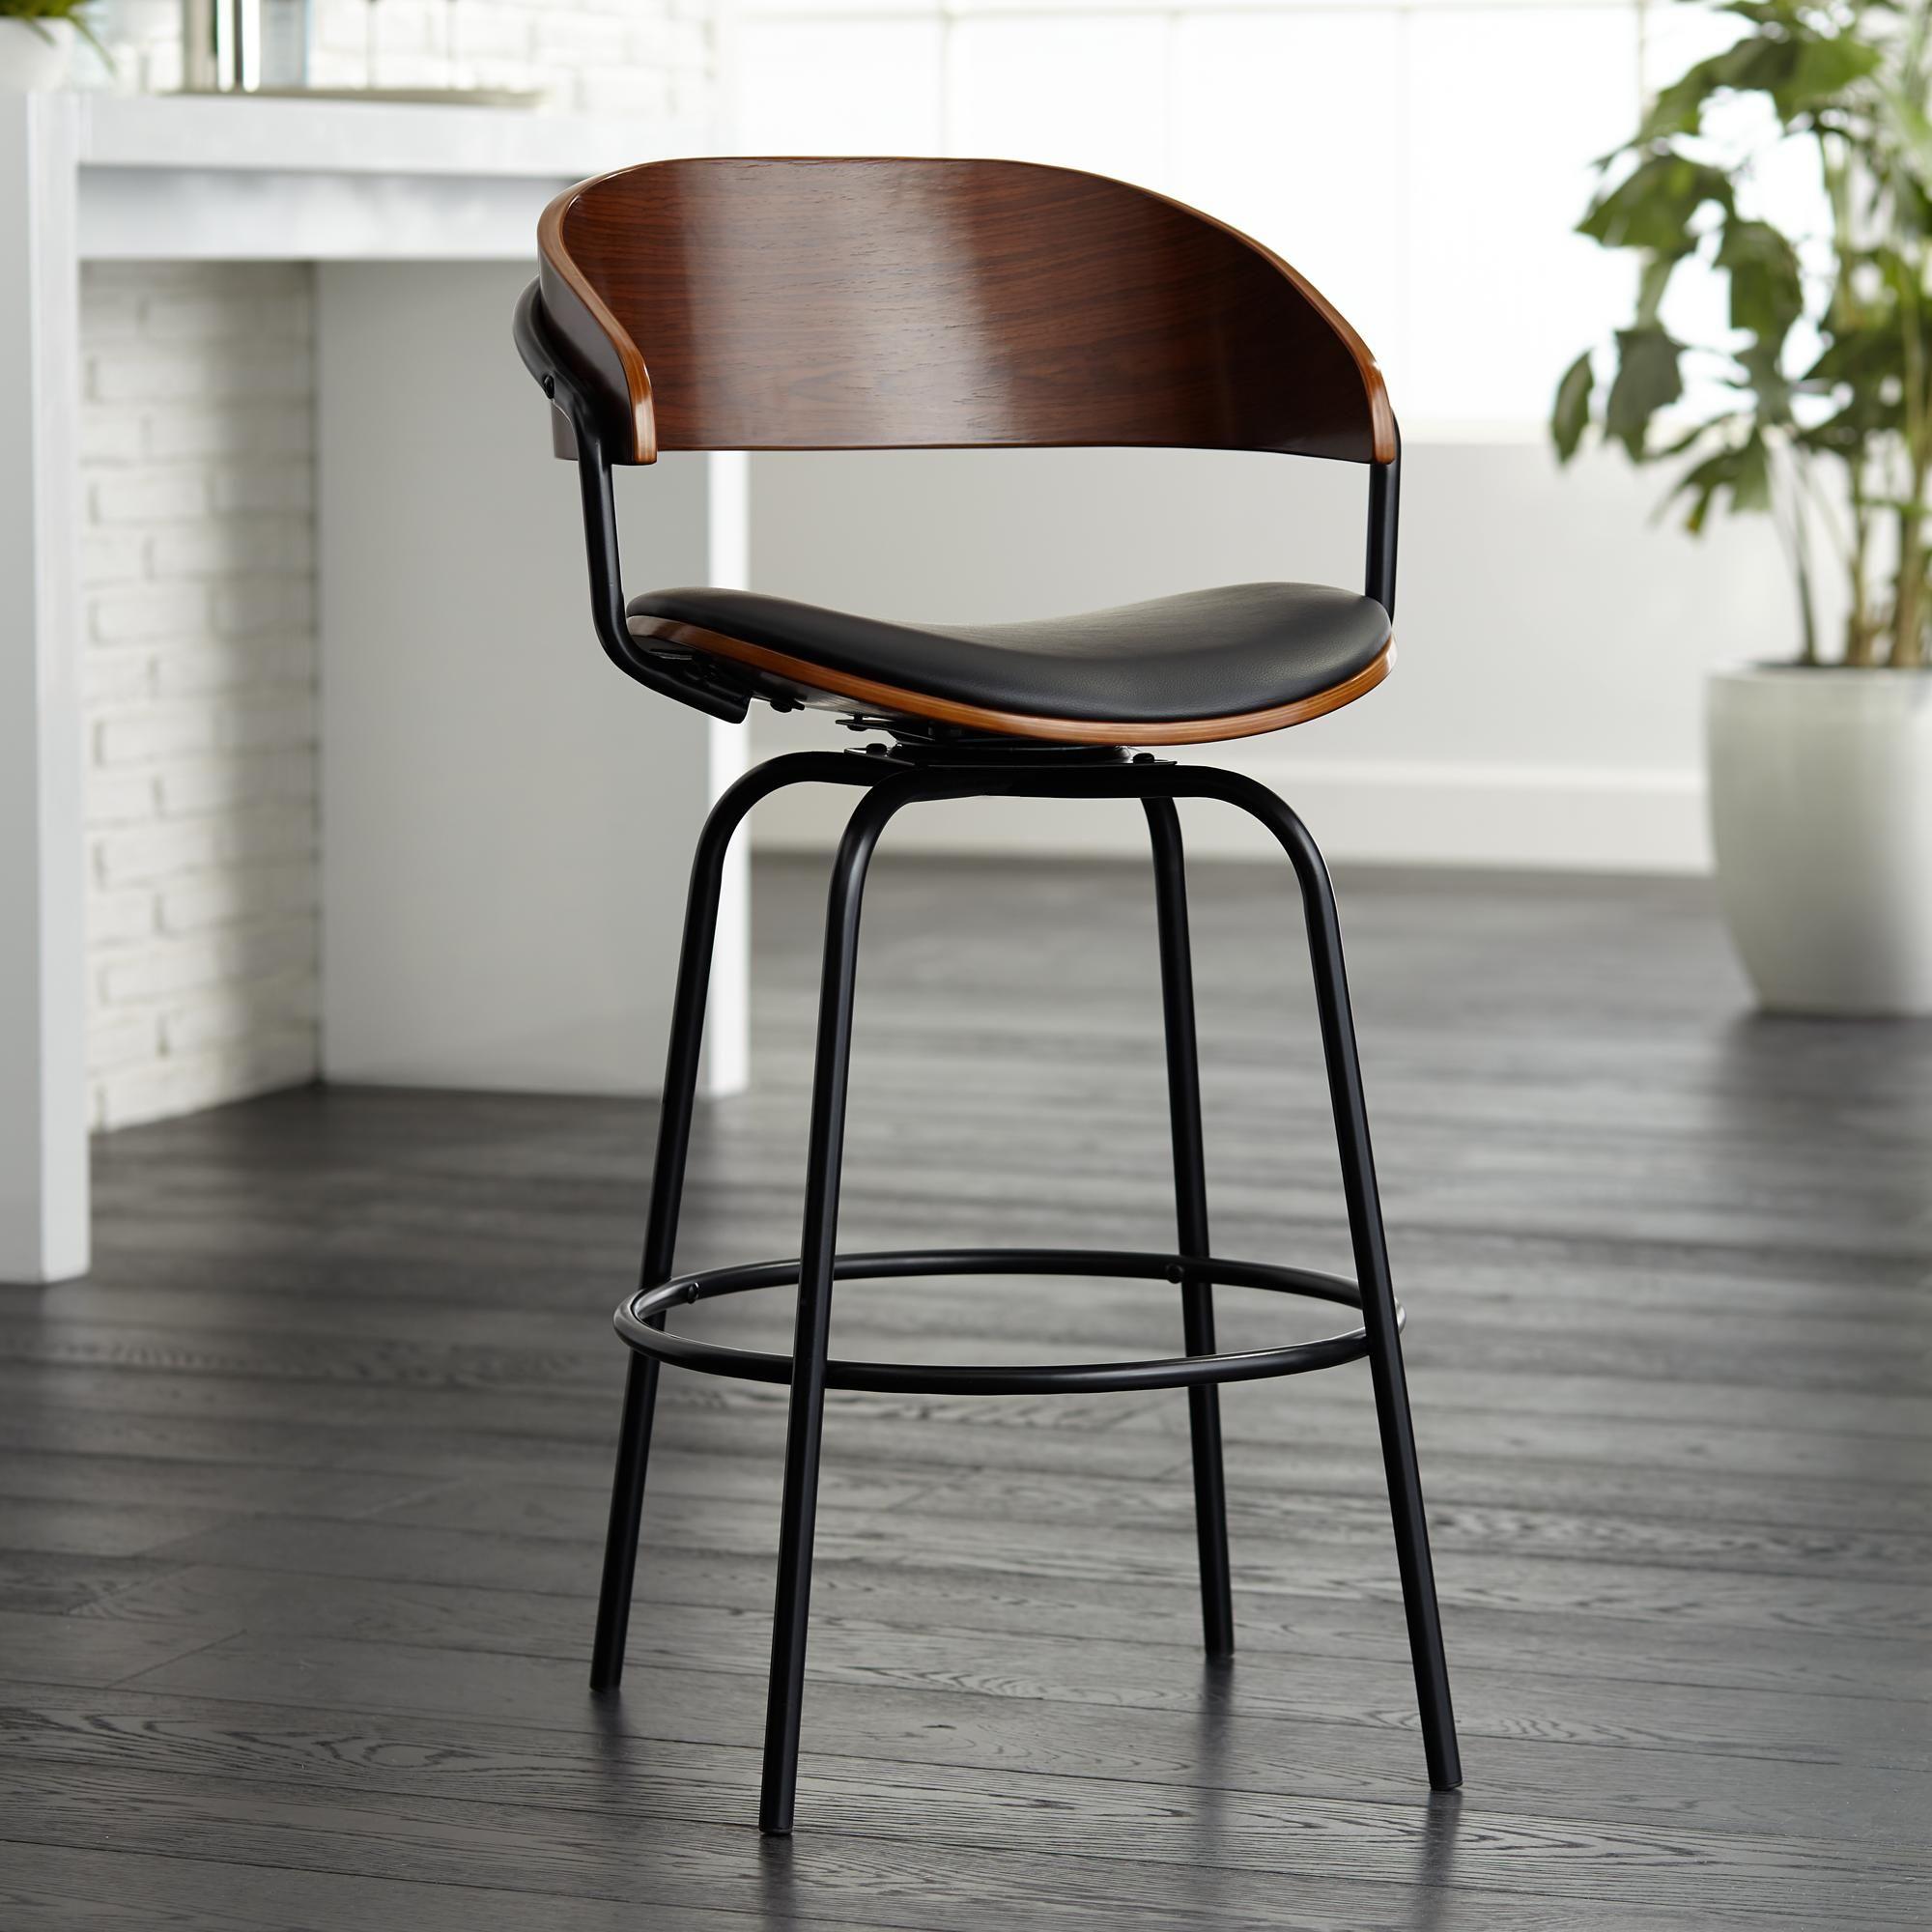 Larsen 26 Inch High Black And Walnut Swivel Counter Stool In 2020